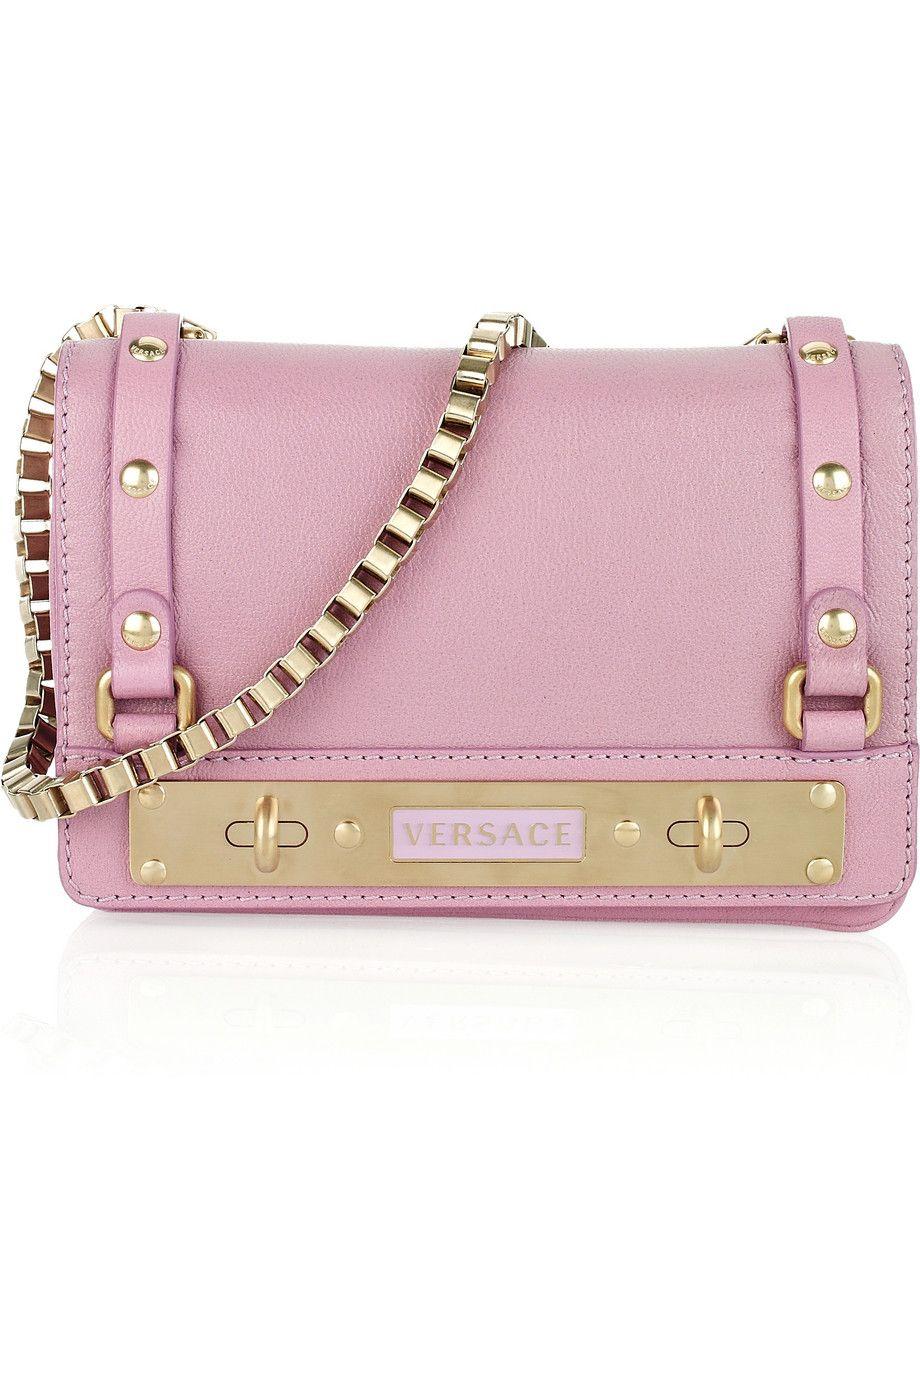 7b67baebeb5 VERSACE Pink Leather…   ◛̑*[ḦɐƝđ] ɱэ ðå [ḂɒǤ]*◛̑   Versa…